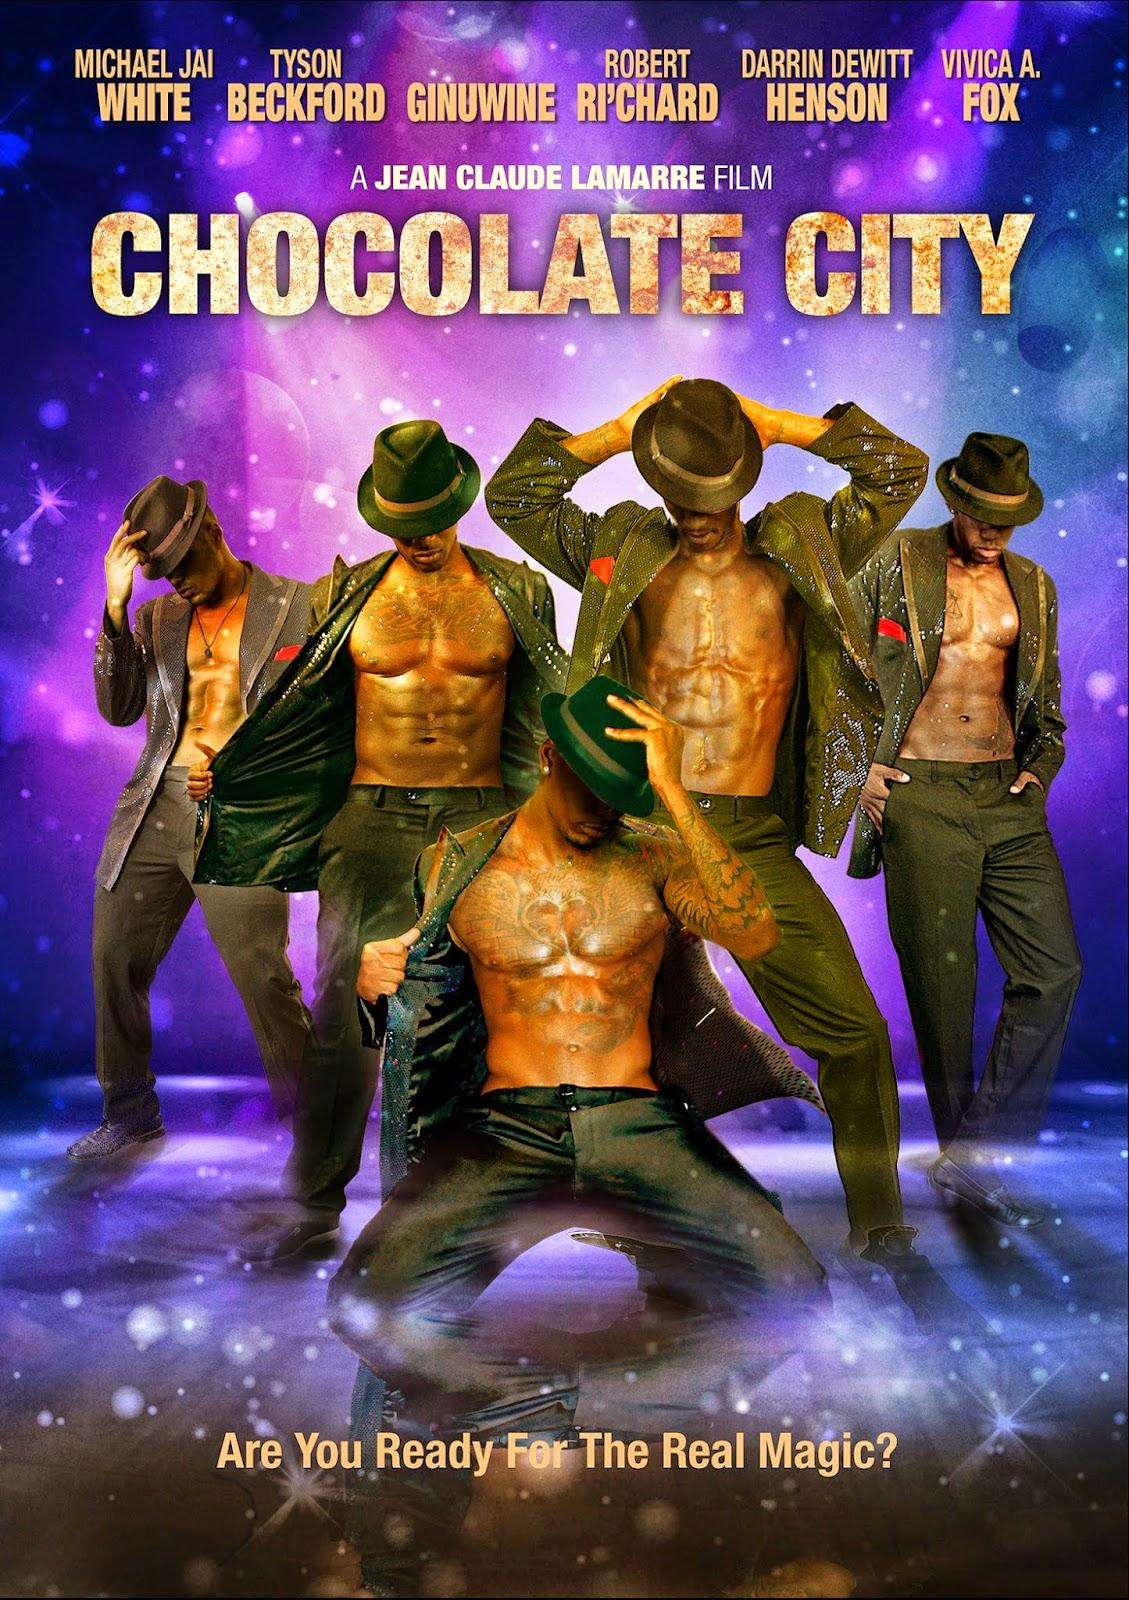 Chocolate City Movie Trailer : Teaser Trailer